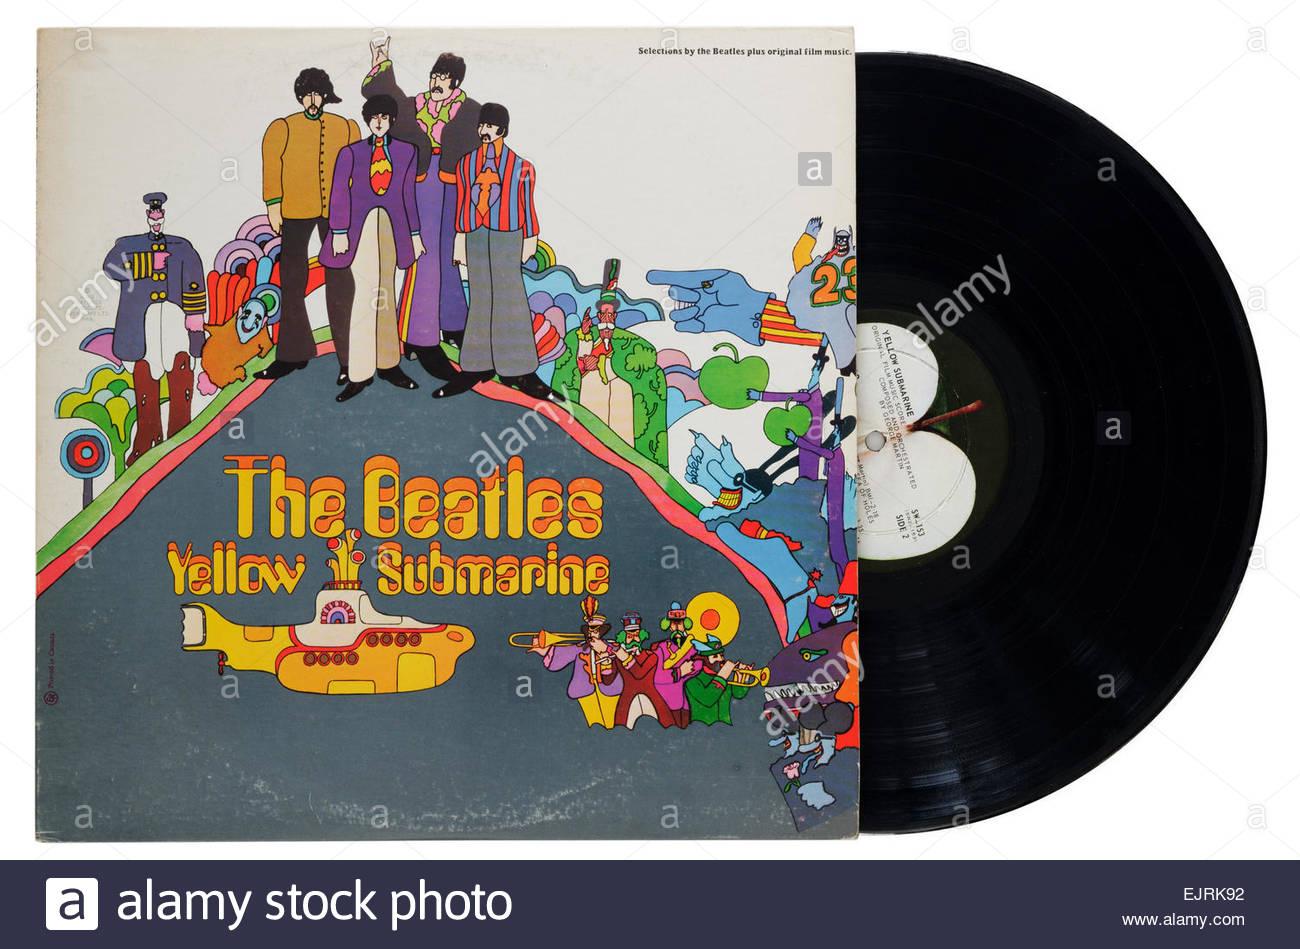 Beatles Yellow Submarine album - Stock Image